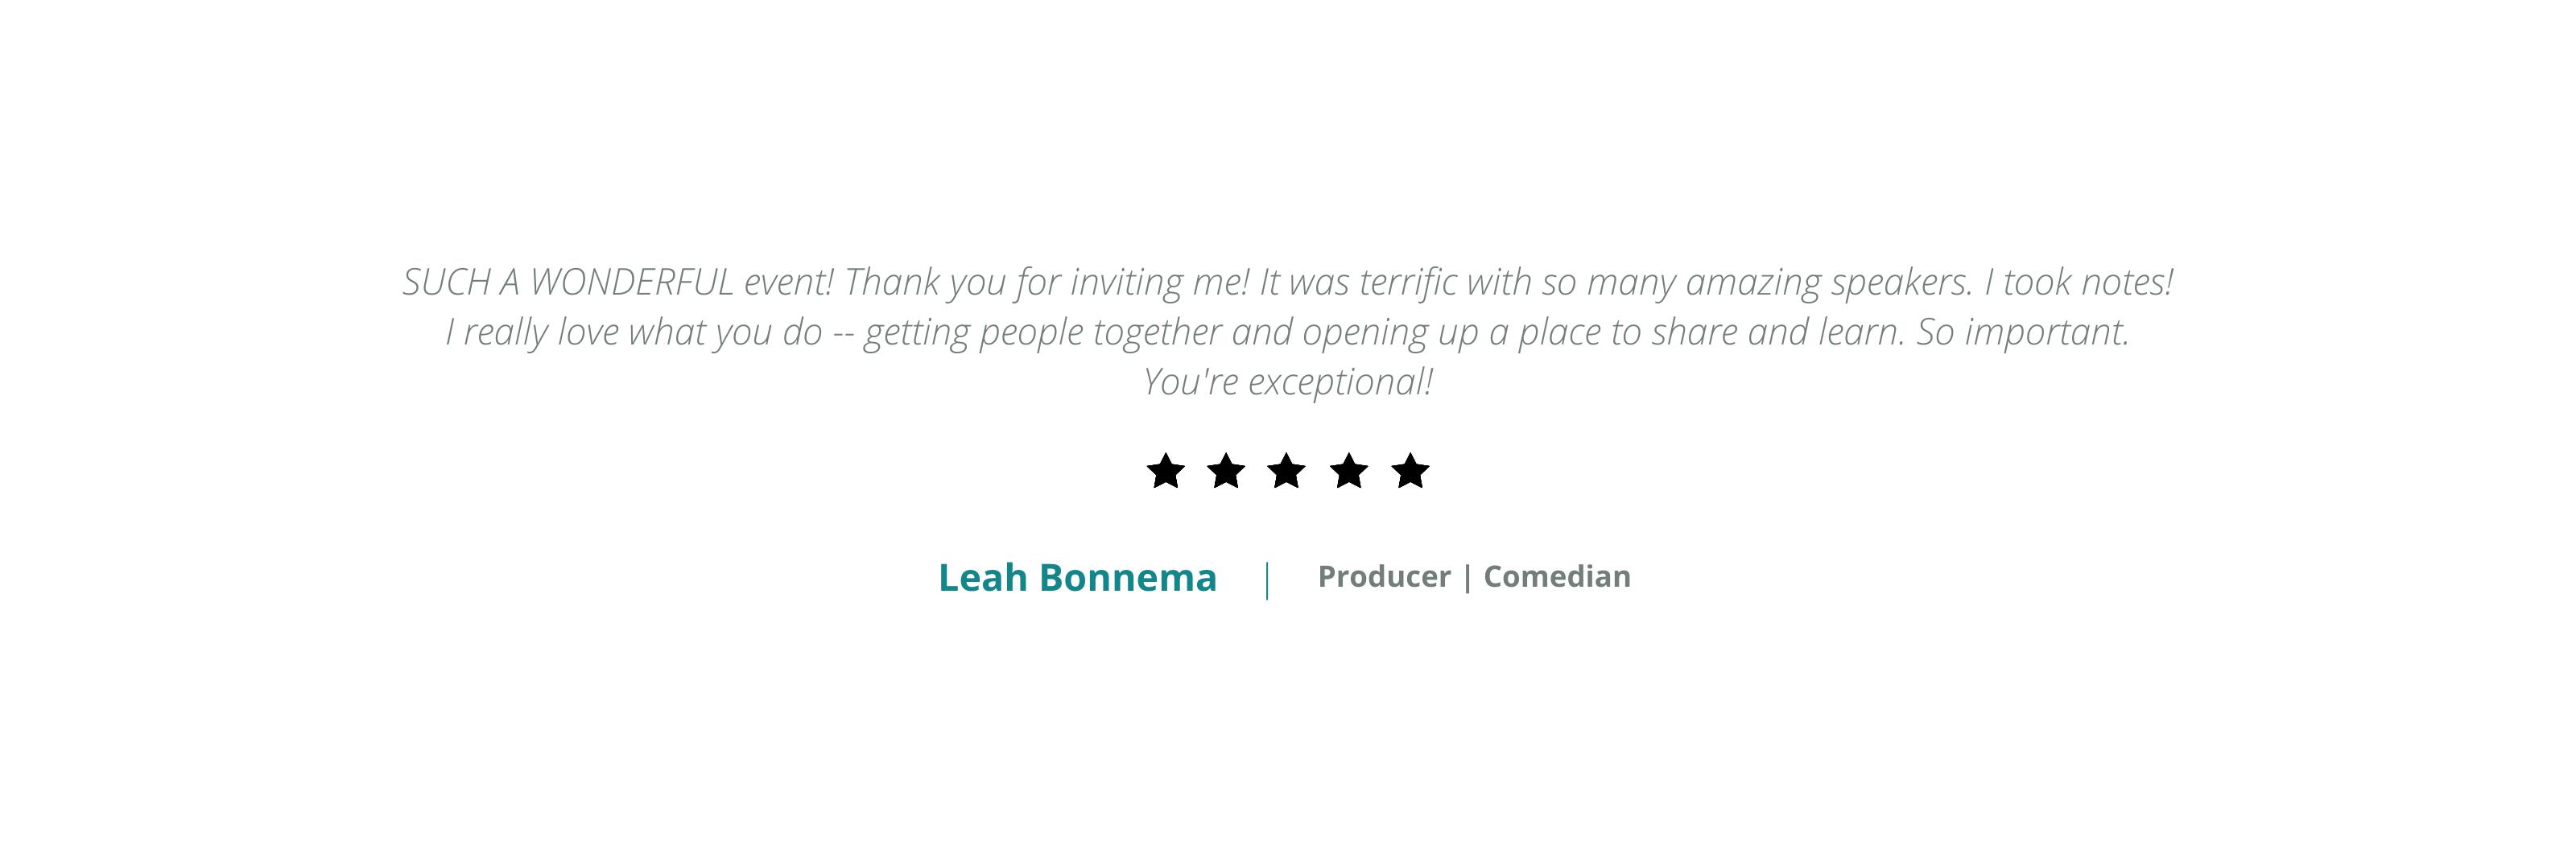 Leah Bonnema